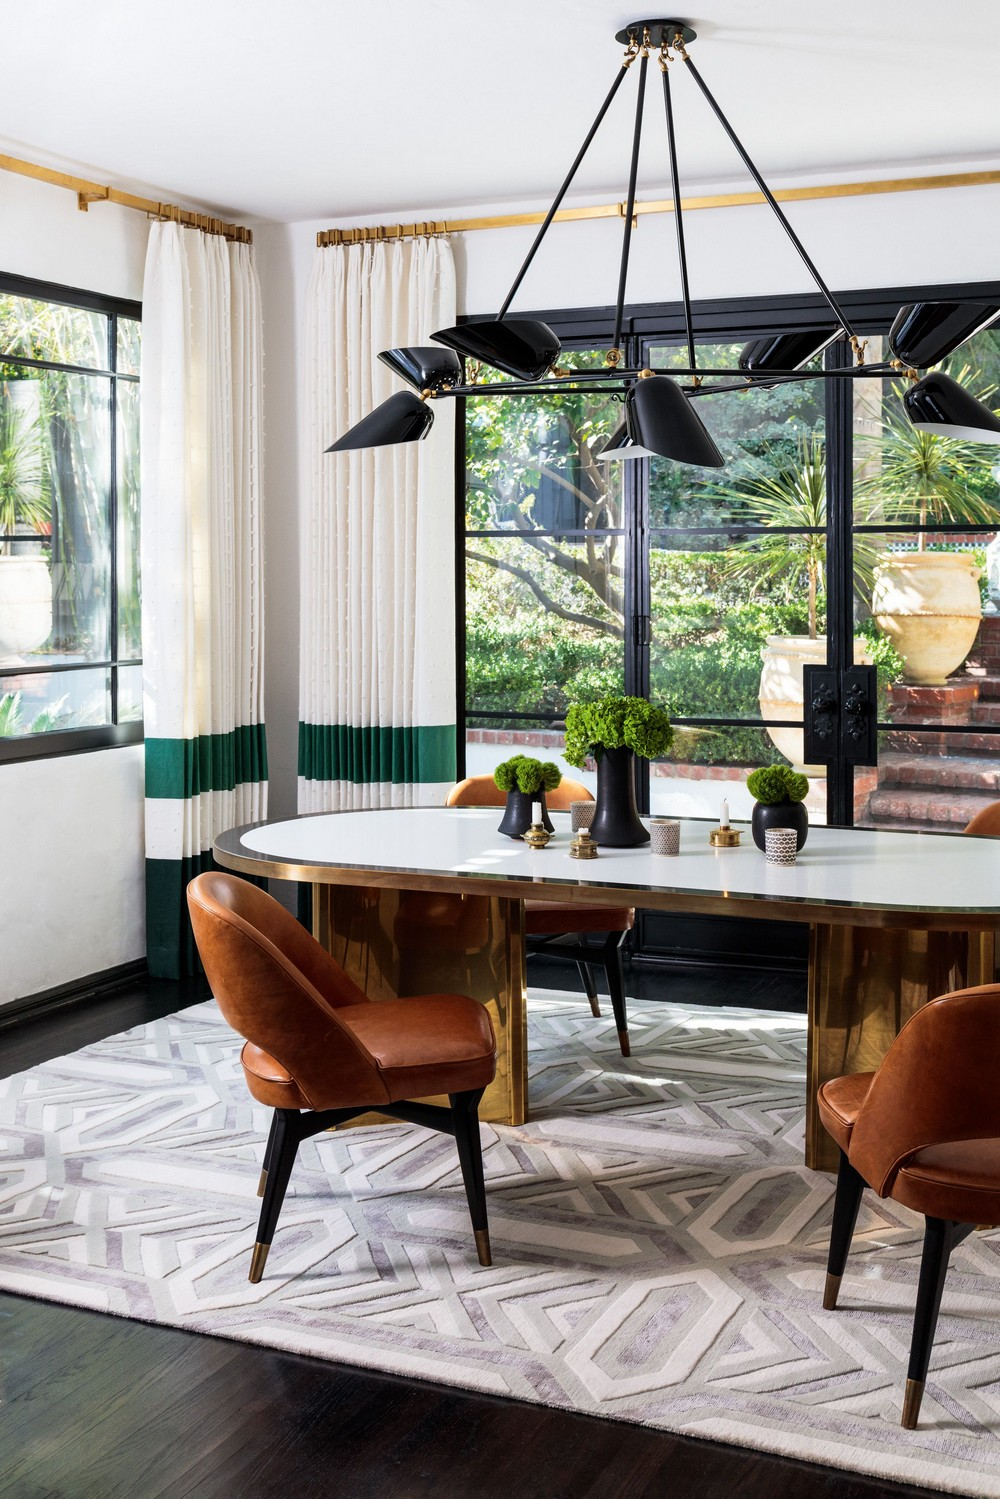 martyn lawrence bullard Dining Room Projects by Martyn Lawrence Bullard 1 Pinterest 1